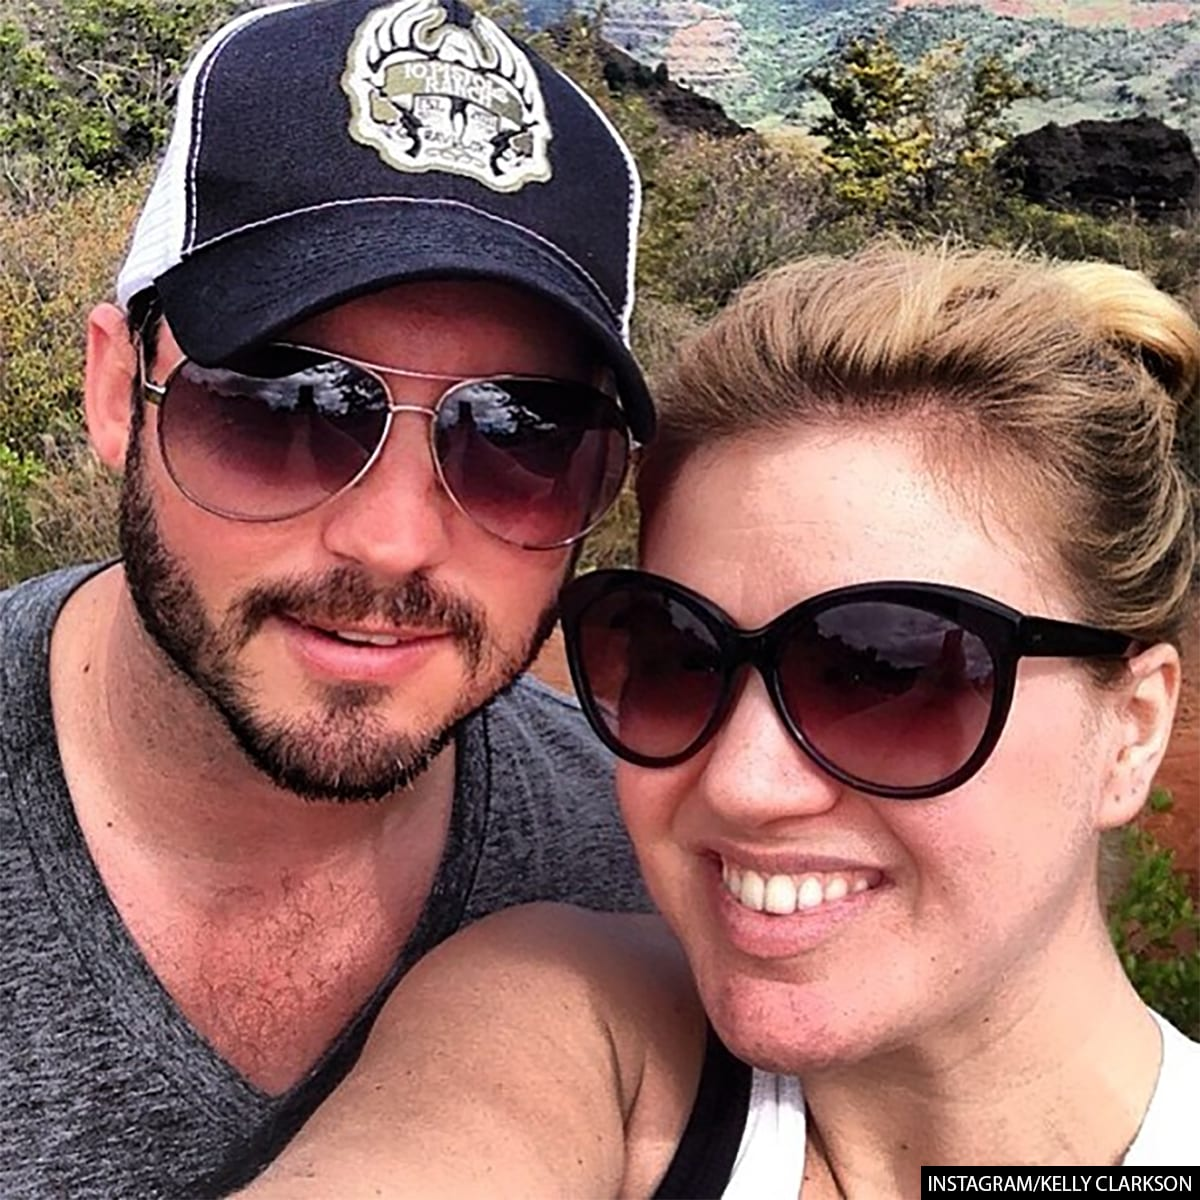 Kelly Clarkson's husband